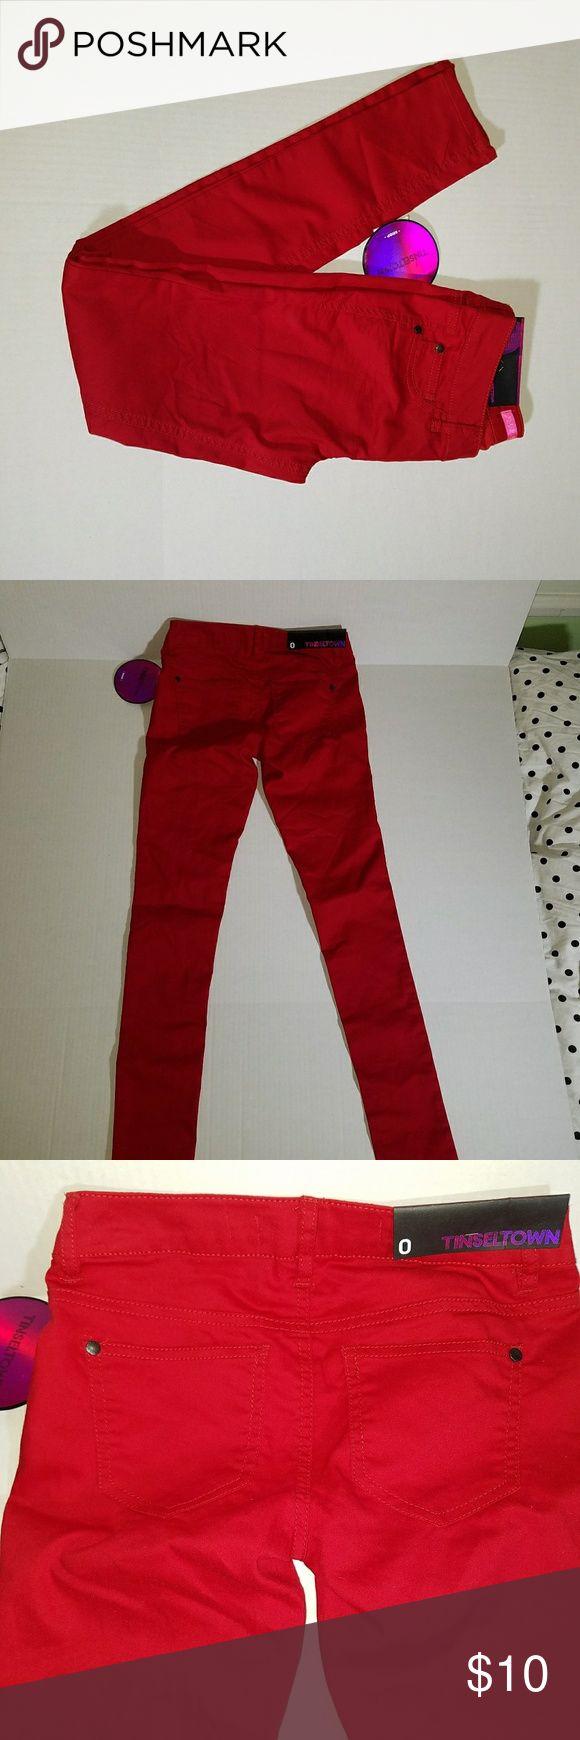 Tinseltown Skinnies Size 0 Tinseltown Skinnies Size 0 Tinseltown Pants Skinny